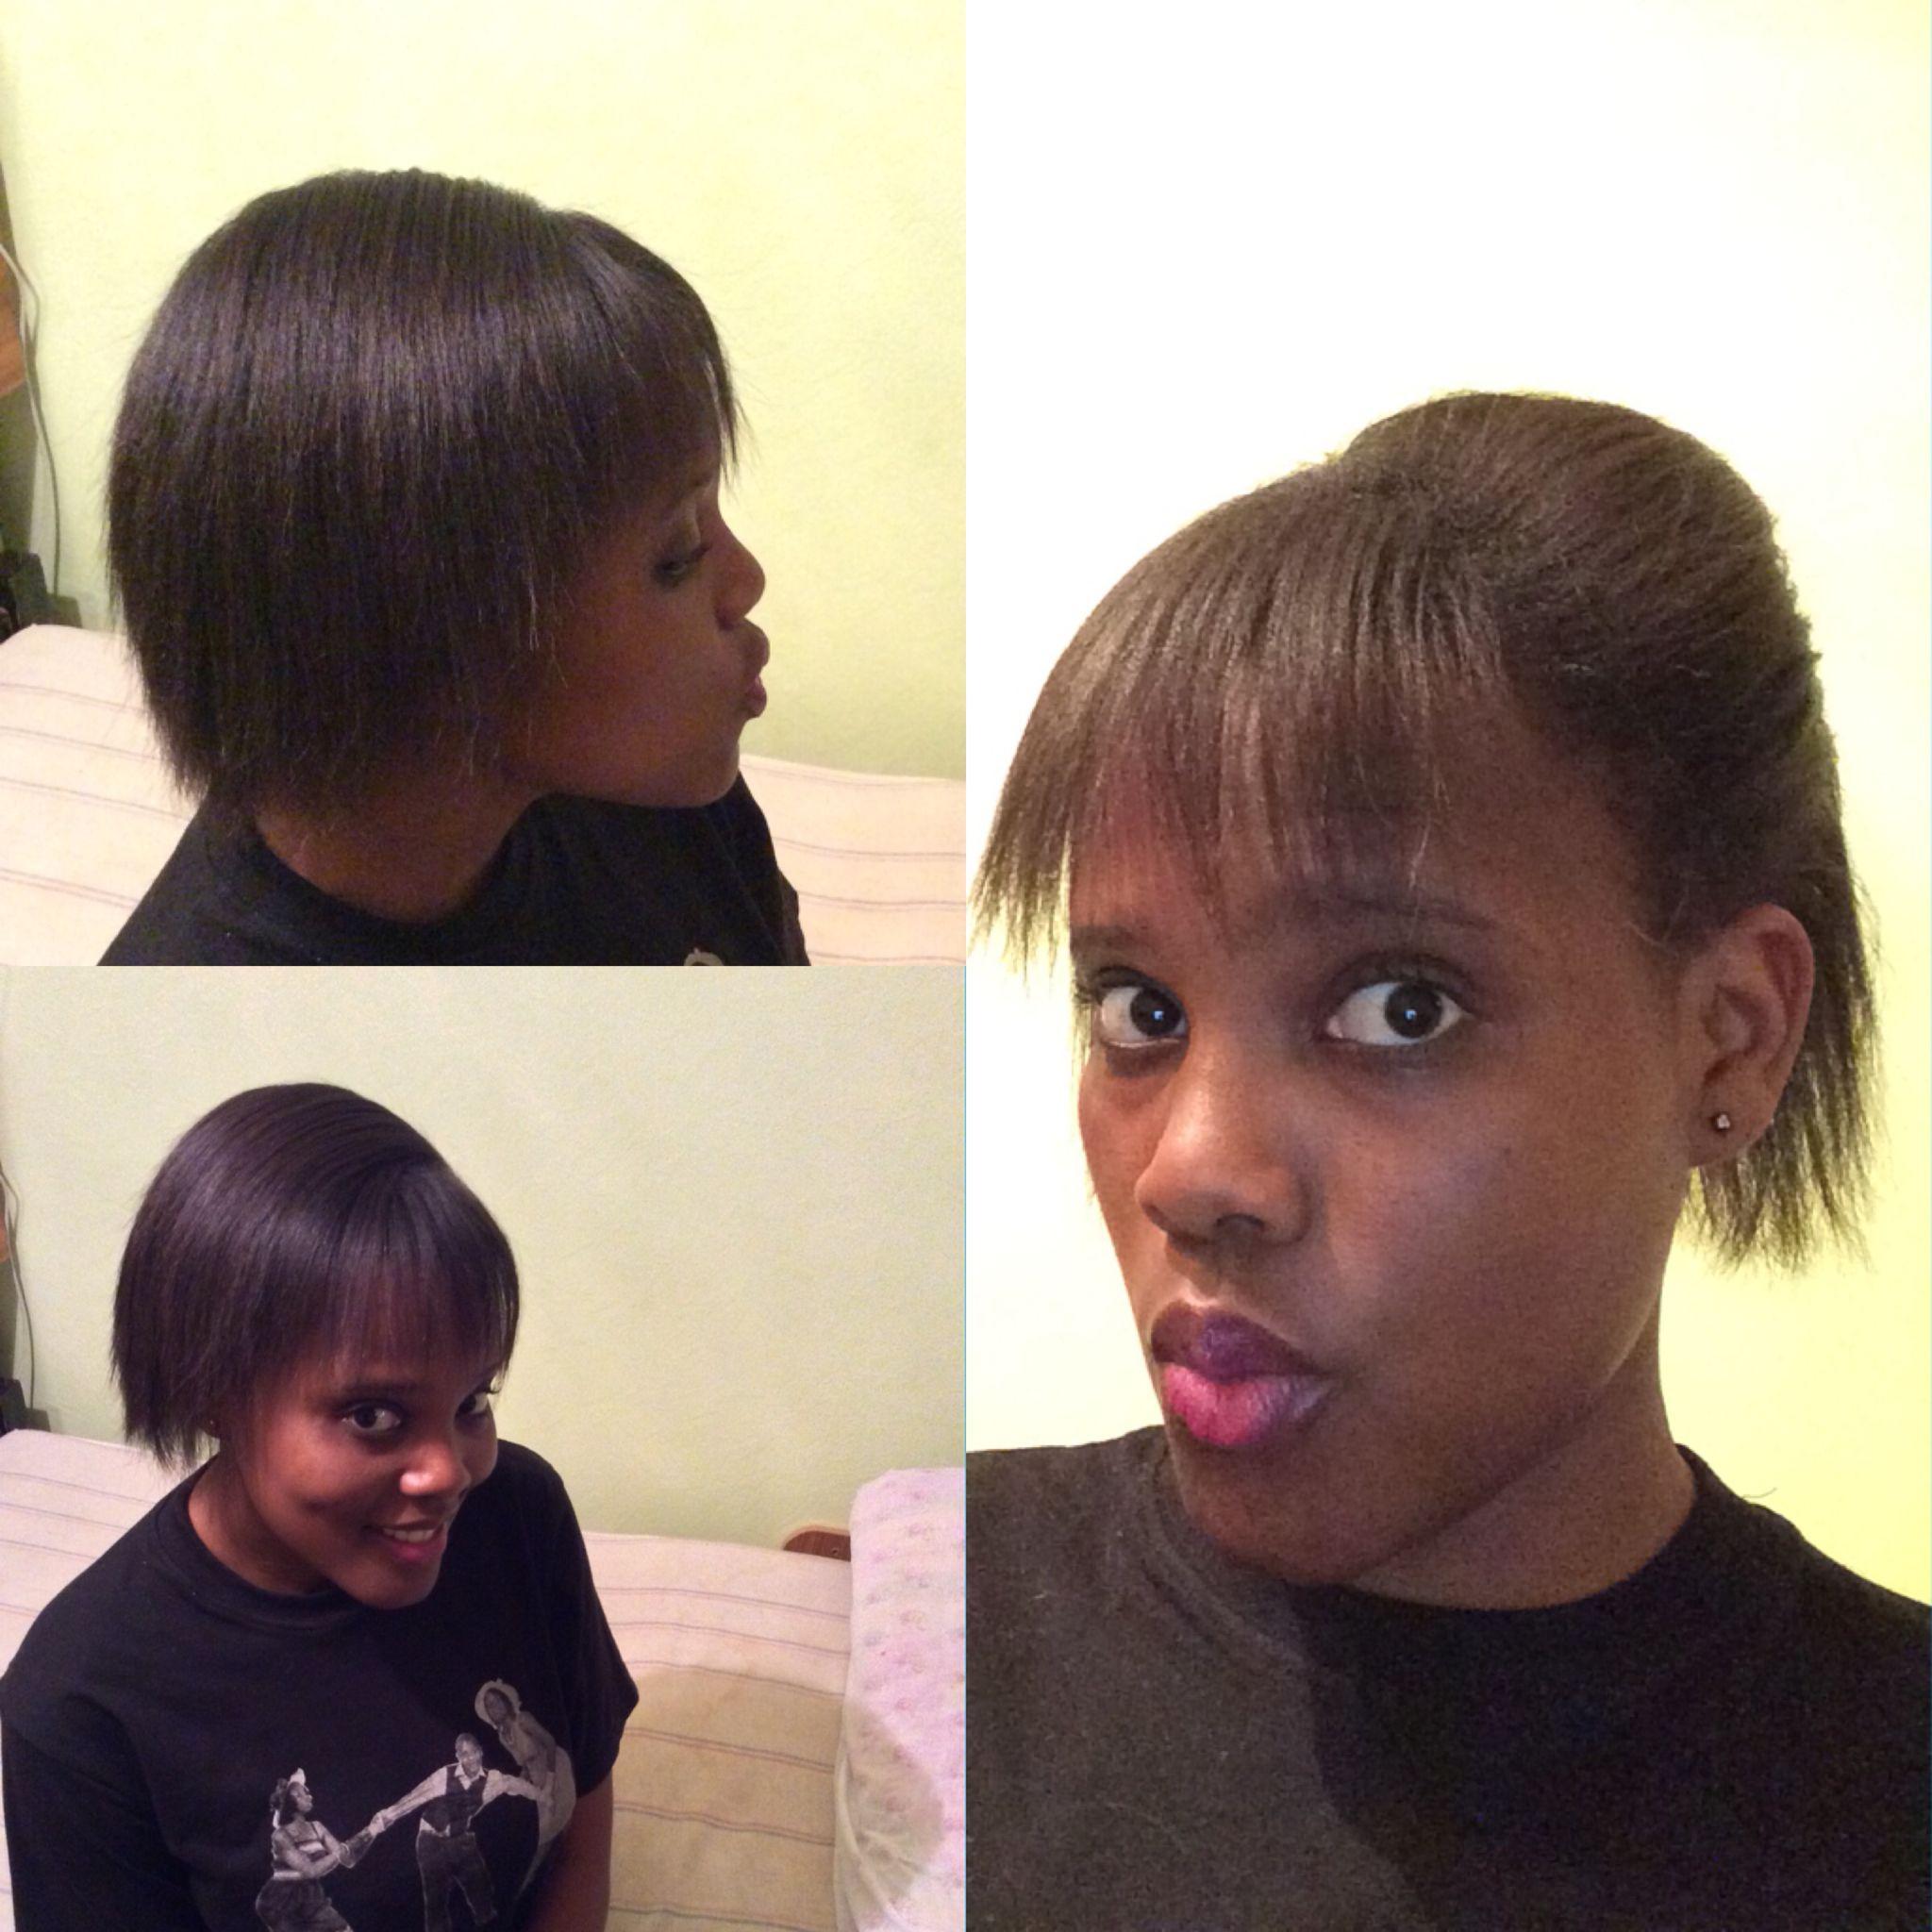 Flat Ironed Short 4c Hair Flat Iron Hair Styles 4c Hairstyles Short Hair Styles